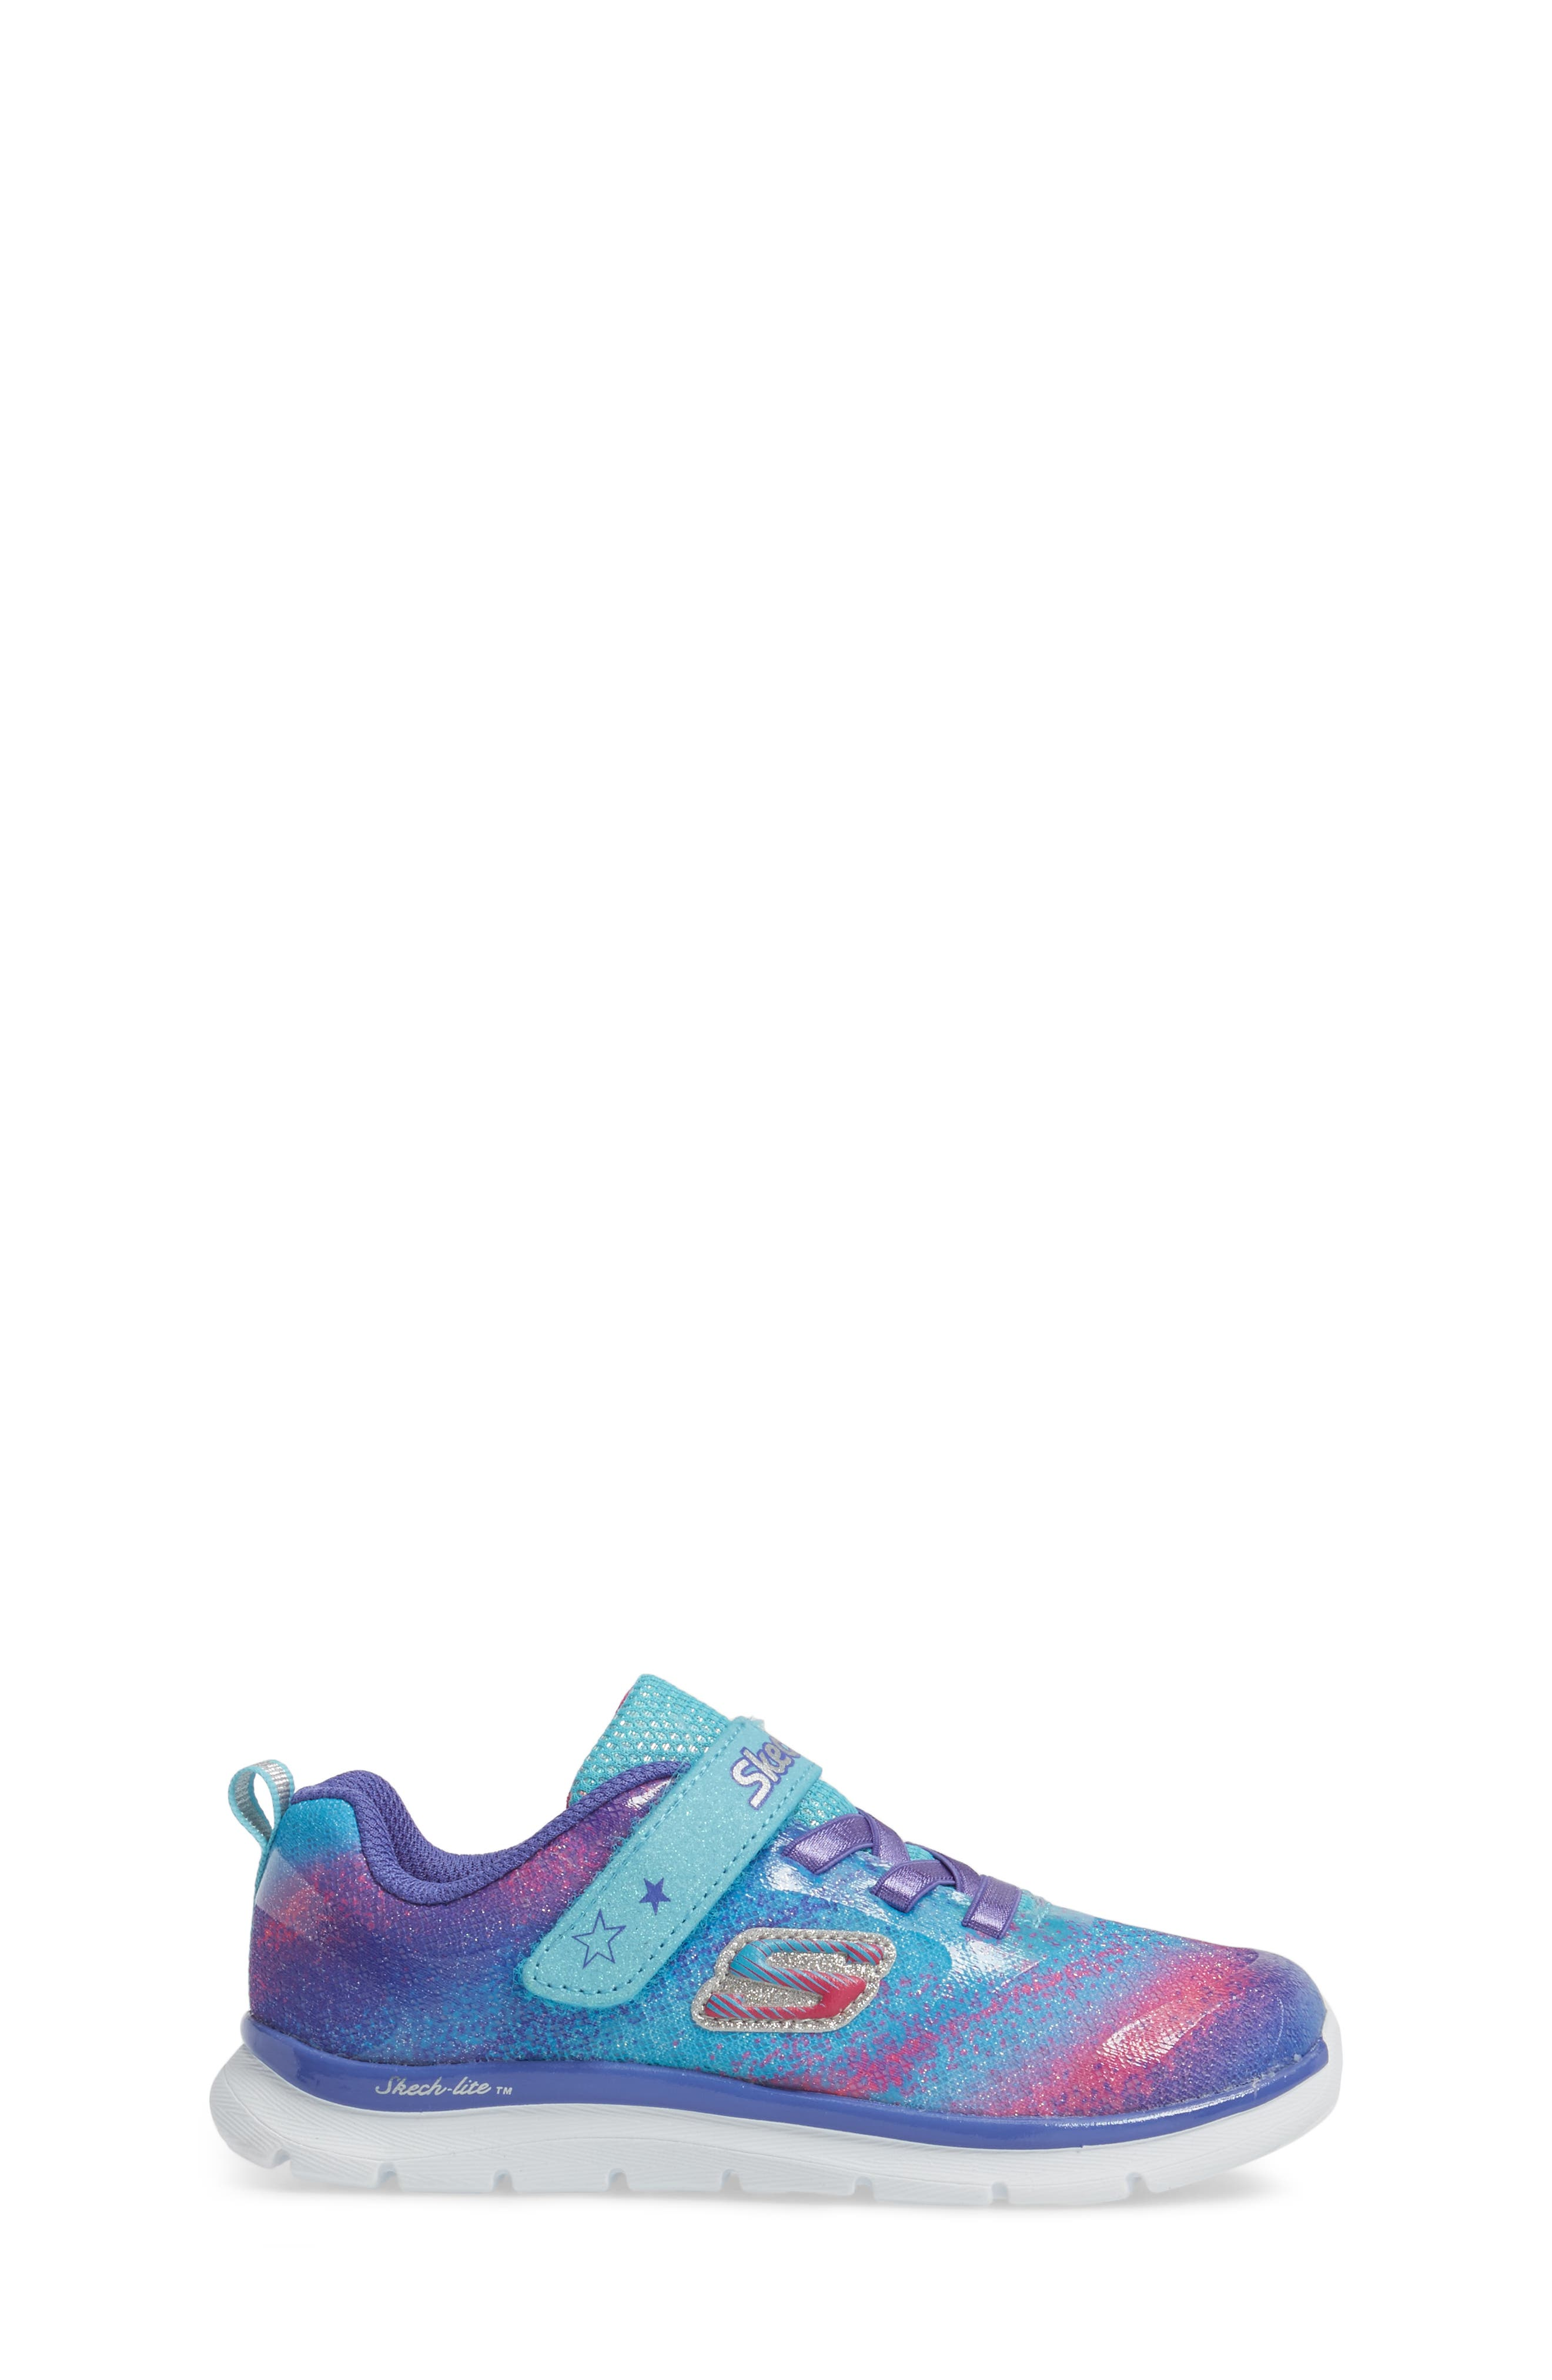 Skech-Lite Colorful Cutie Sneaker,                             Alternate thumbnail 3, color,